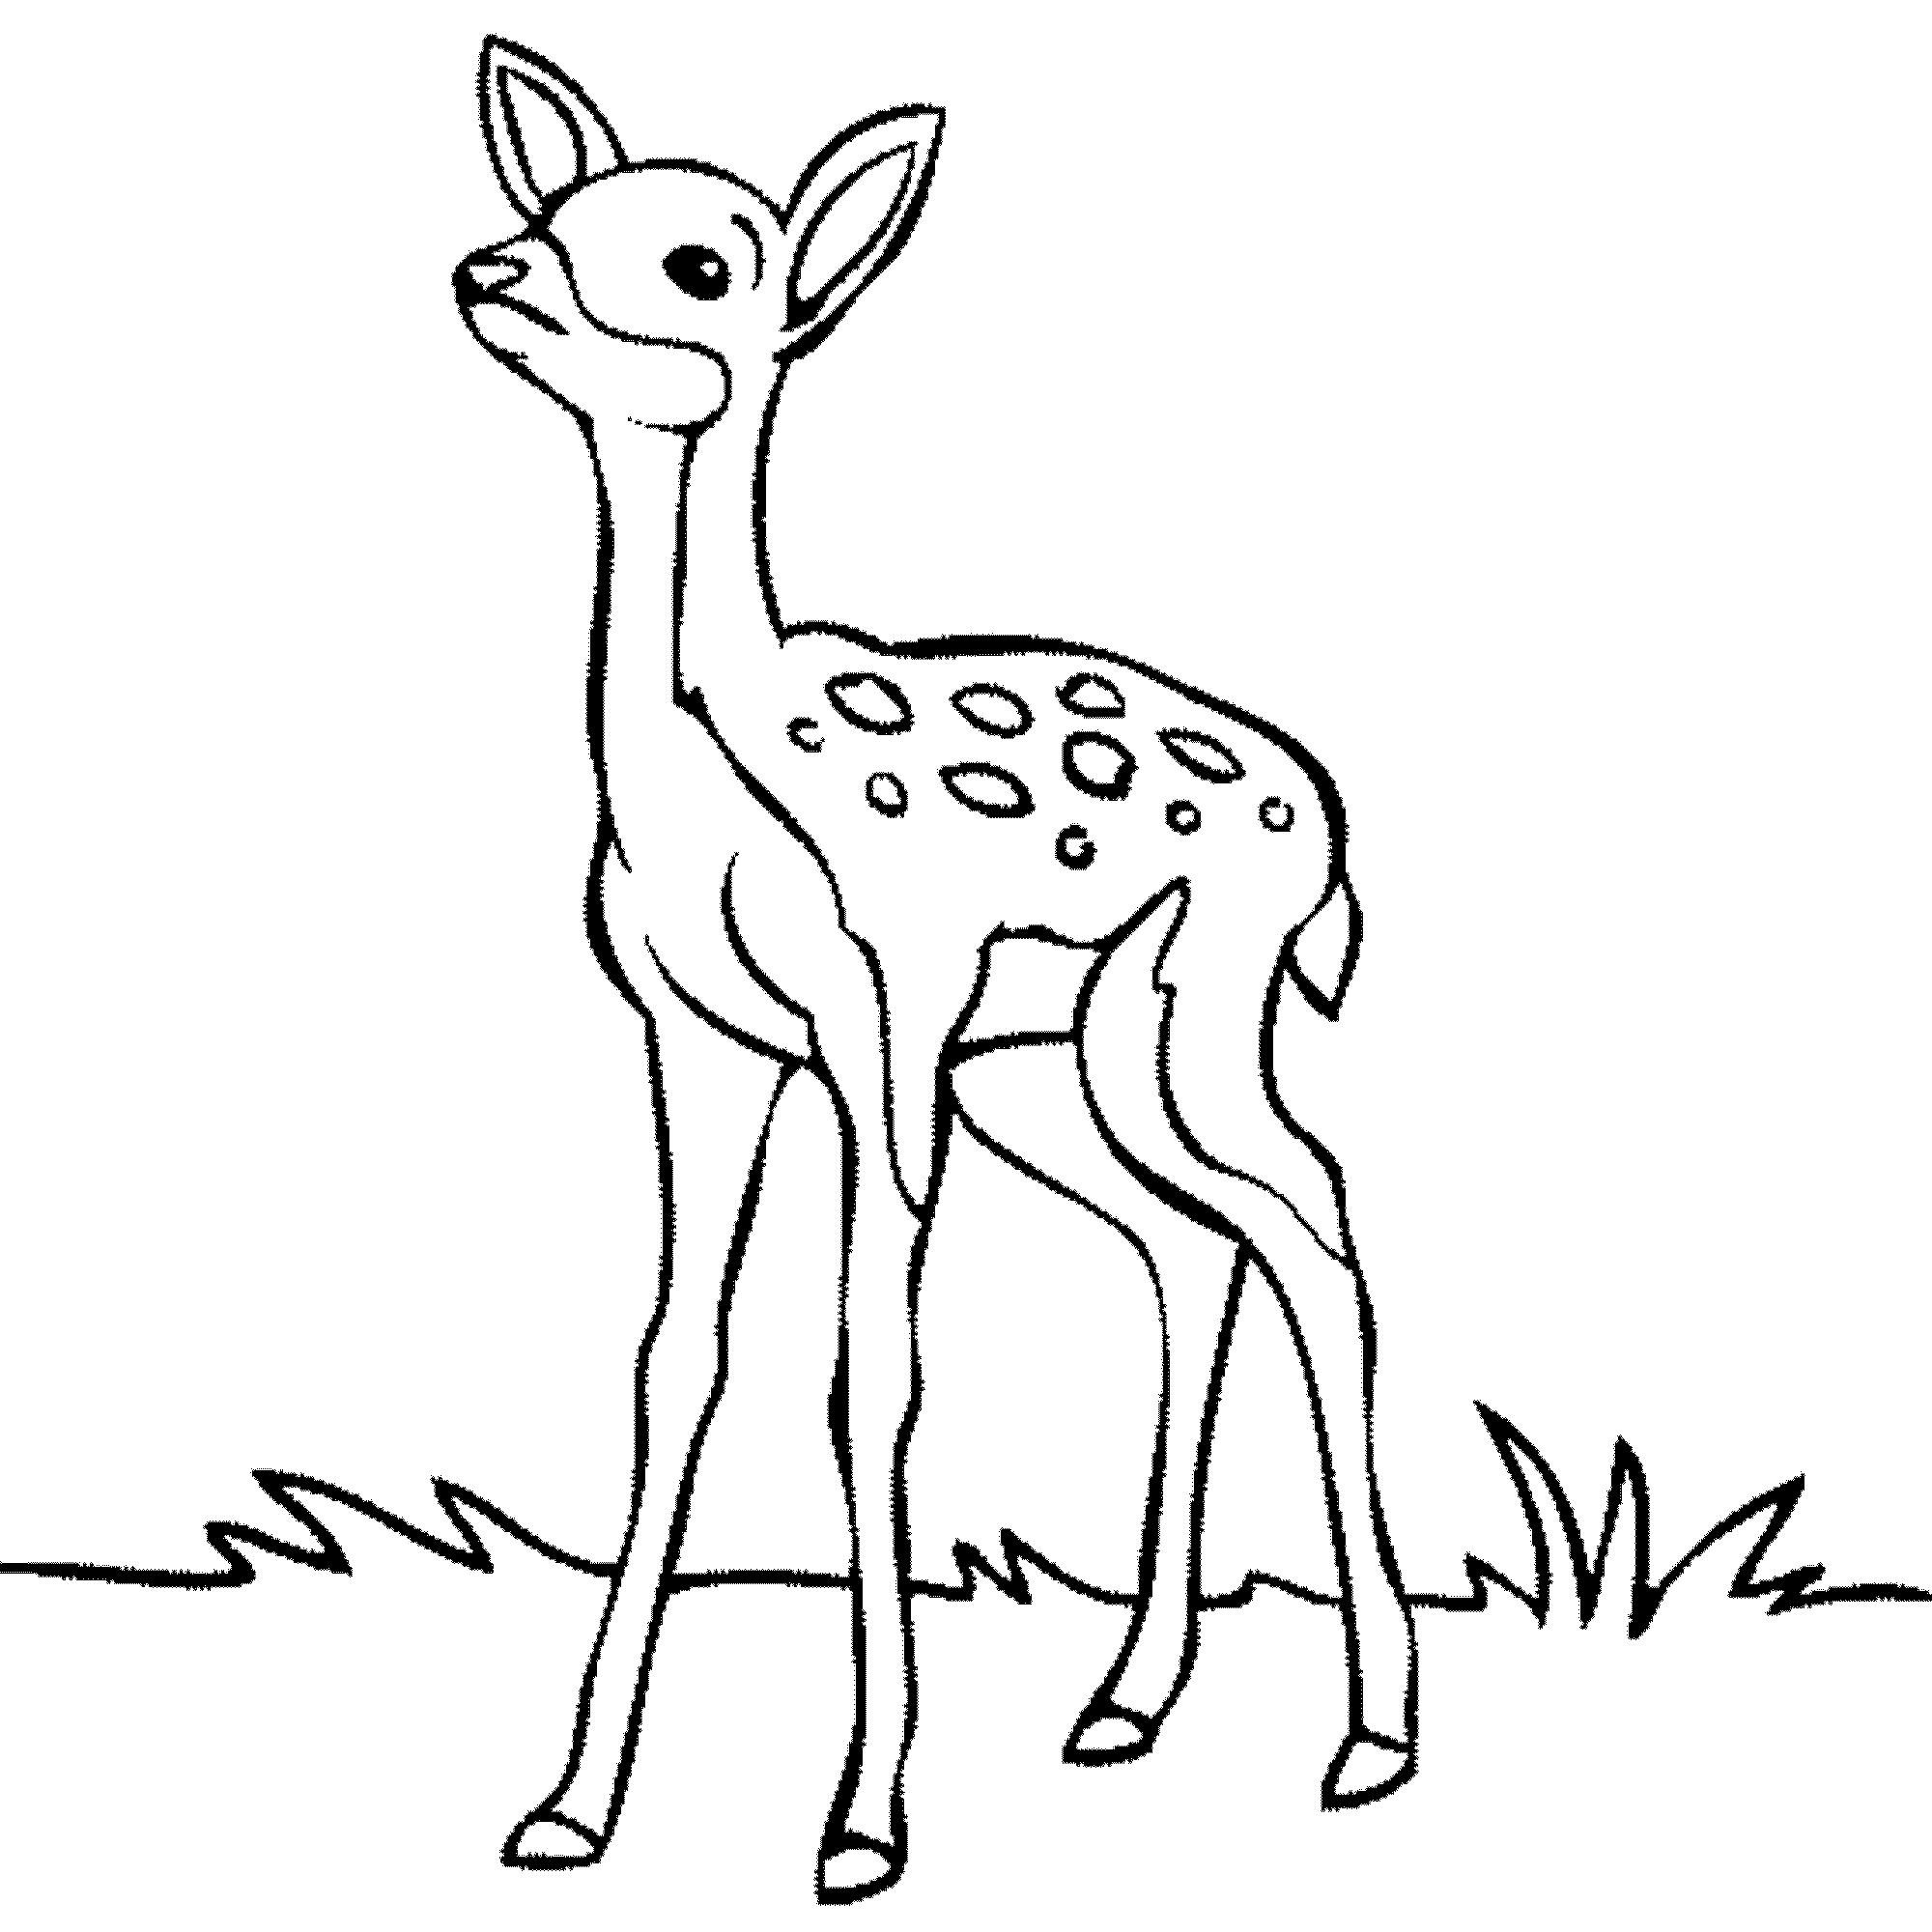 Deer Coloring Pages Cute Deer Coloring Pages